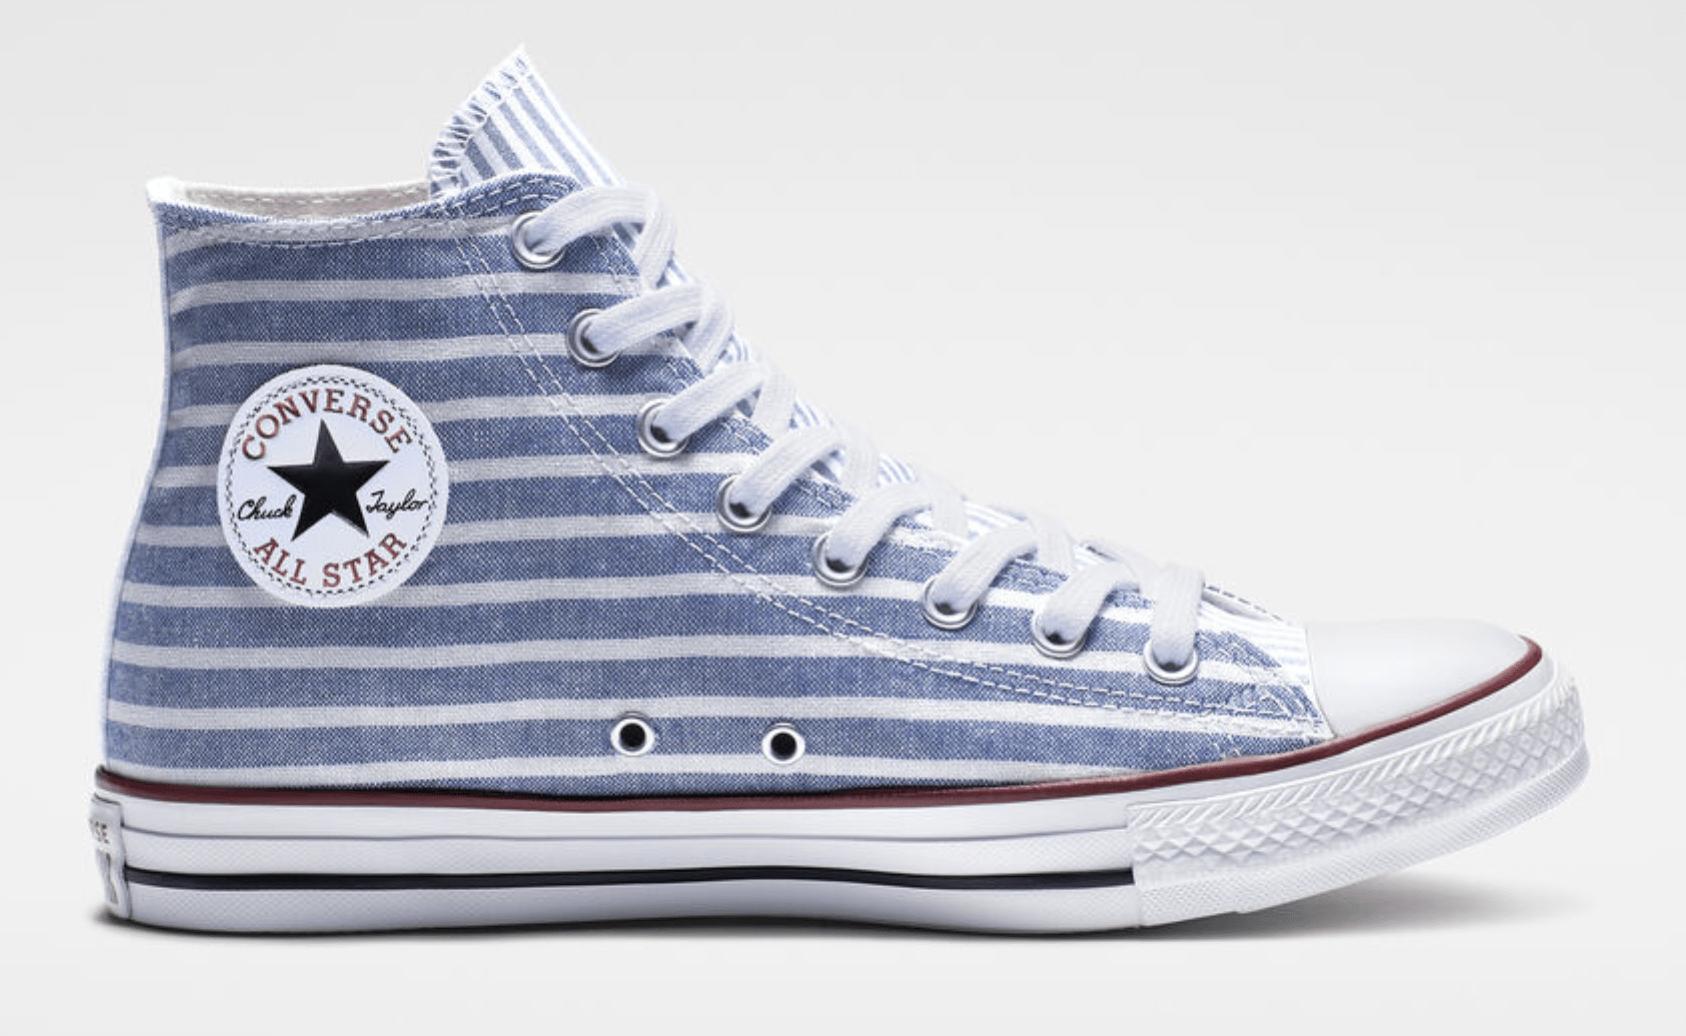 Converse Chuck Taylor Stripes